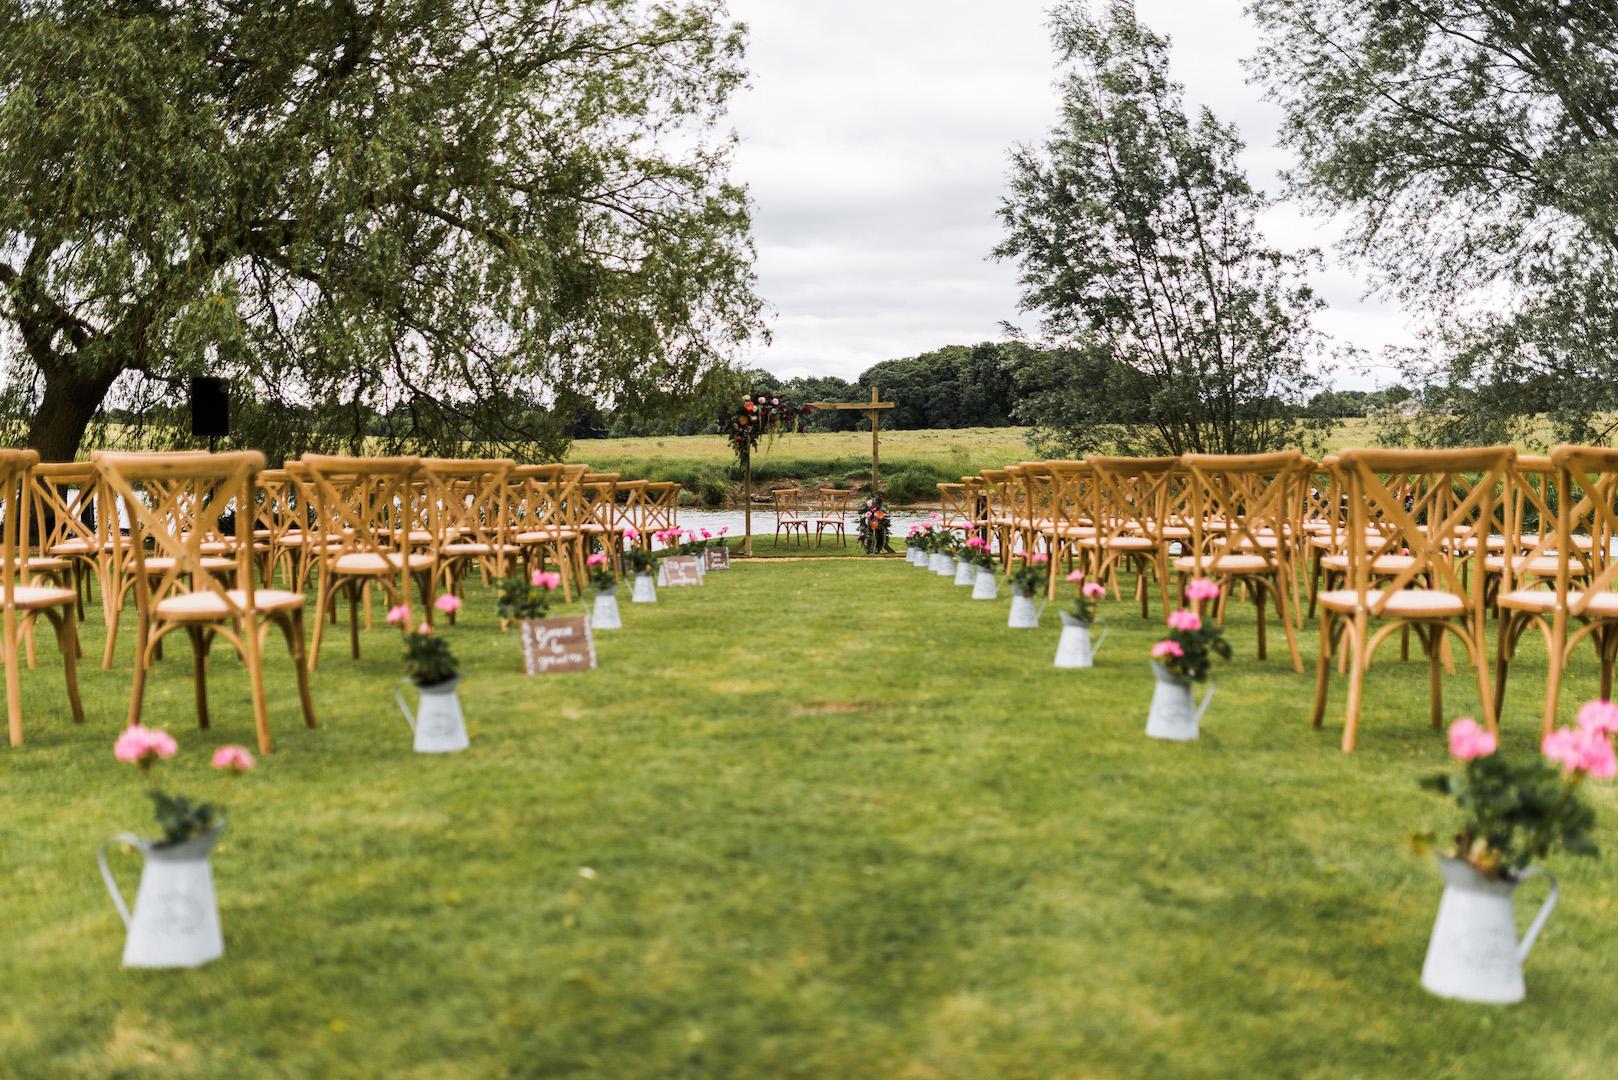 Sarah and Joe's PapaKata Sperry Wedding: Ceremony Setting